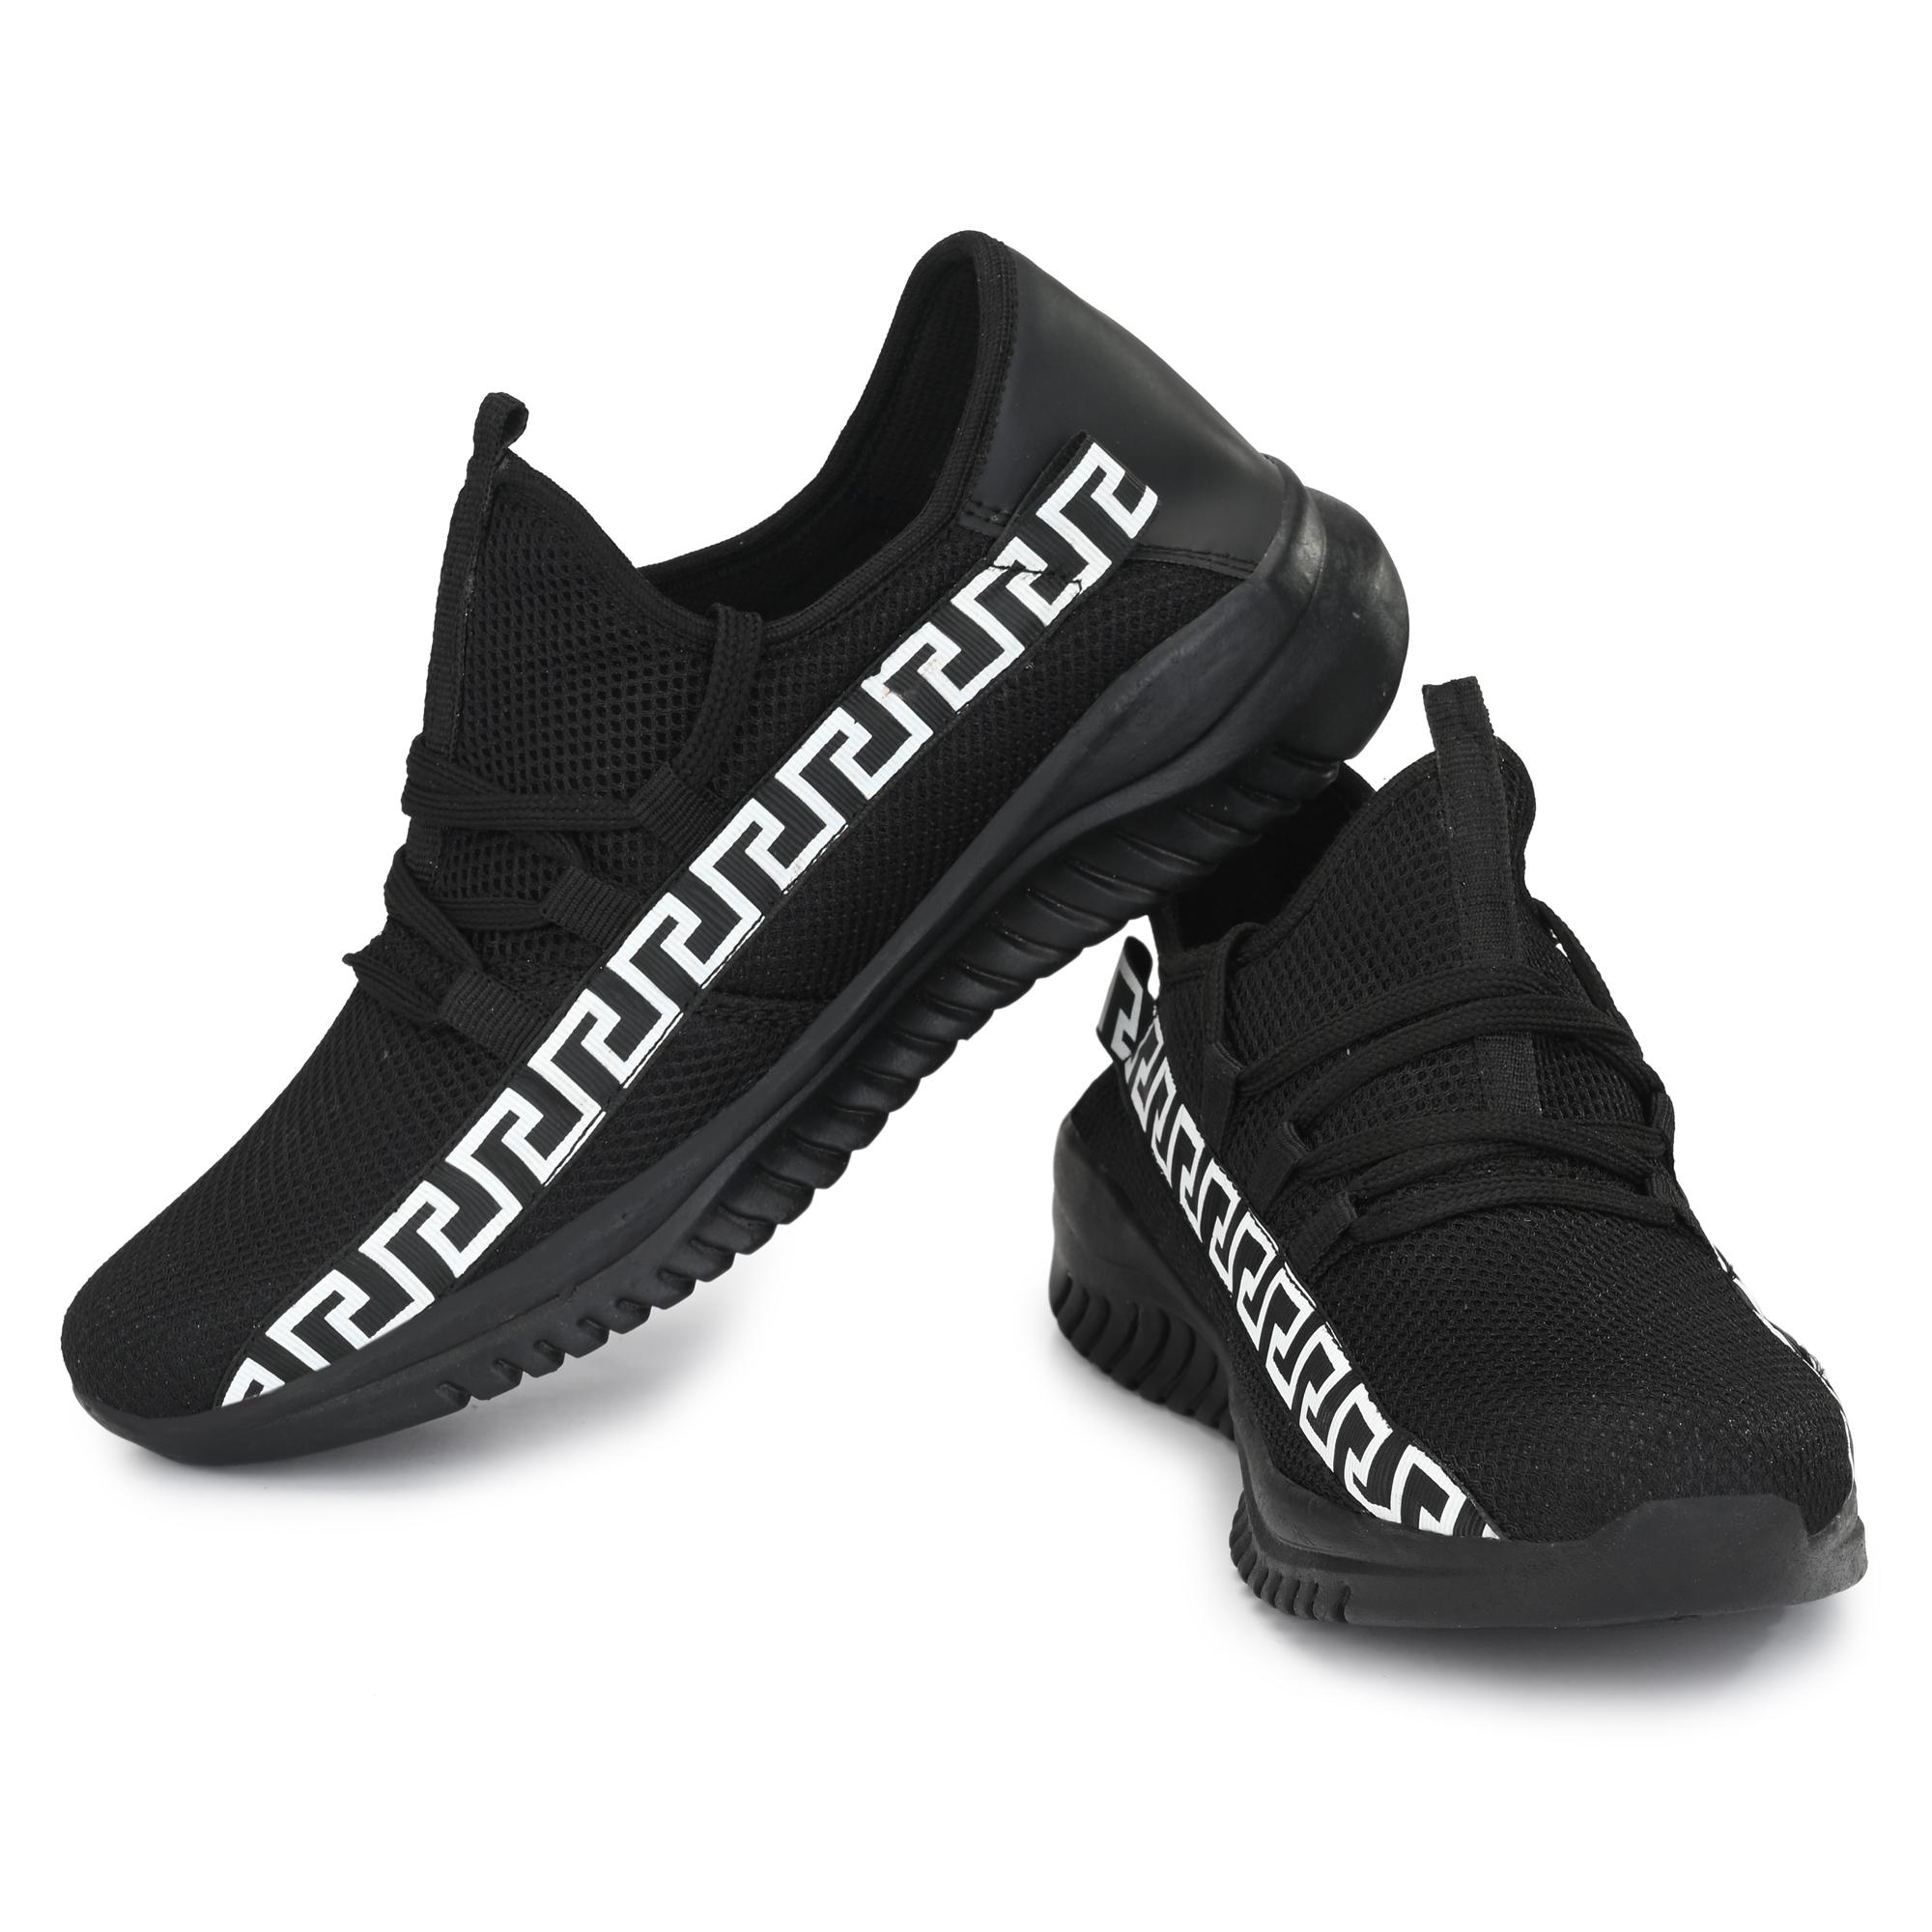 Almighty Black Air Series Mesh Casual Shoes MNBK01 (BLACK, 6-10, 8 PAIRS)